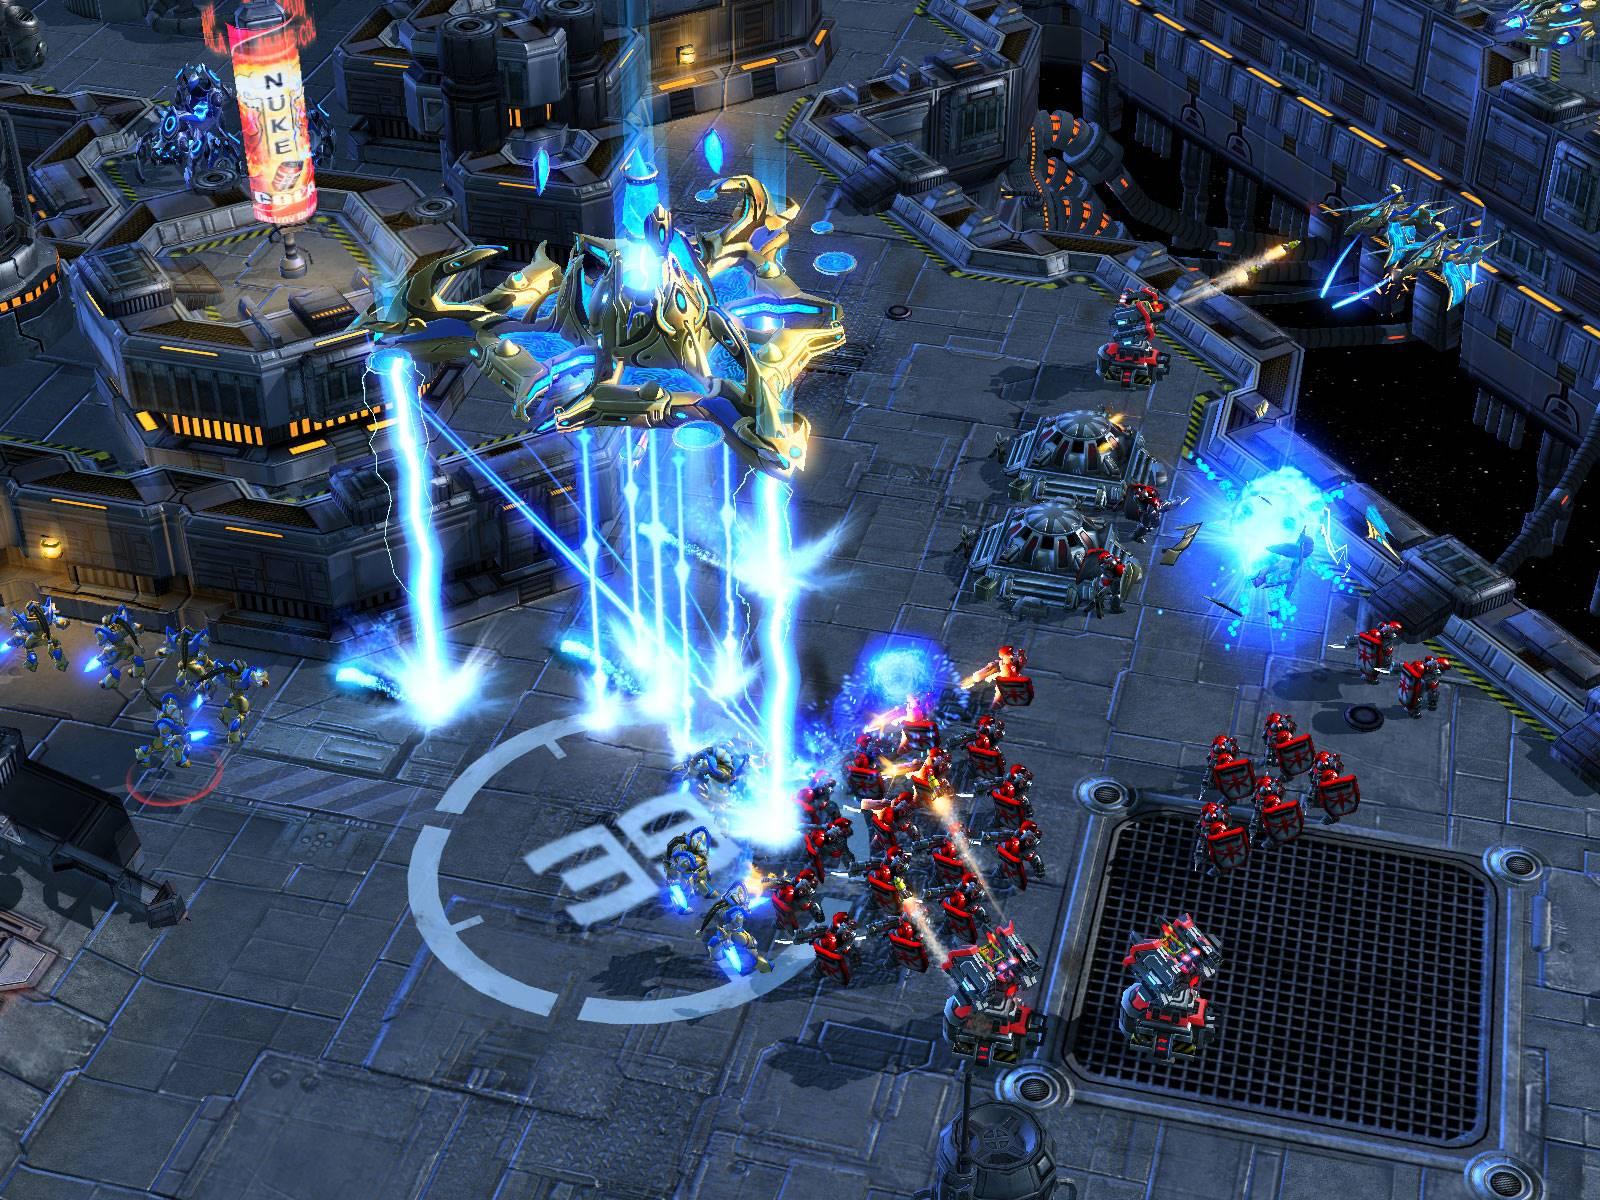 http://terminalgamer.com/wp-content/uploads/2010/01/Starcraft-II1.jpg